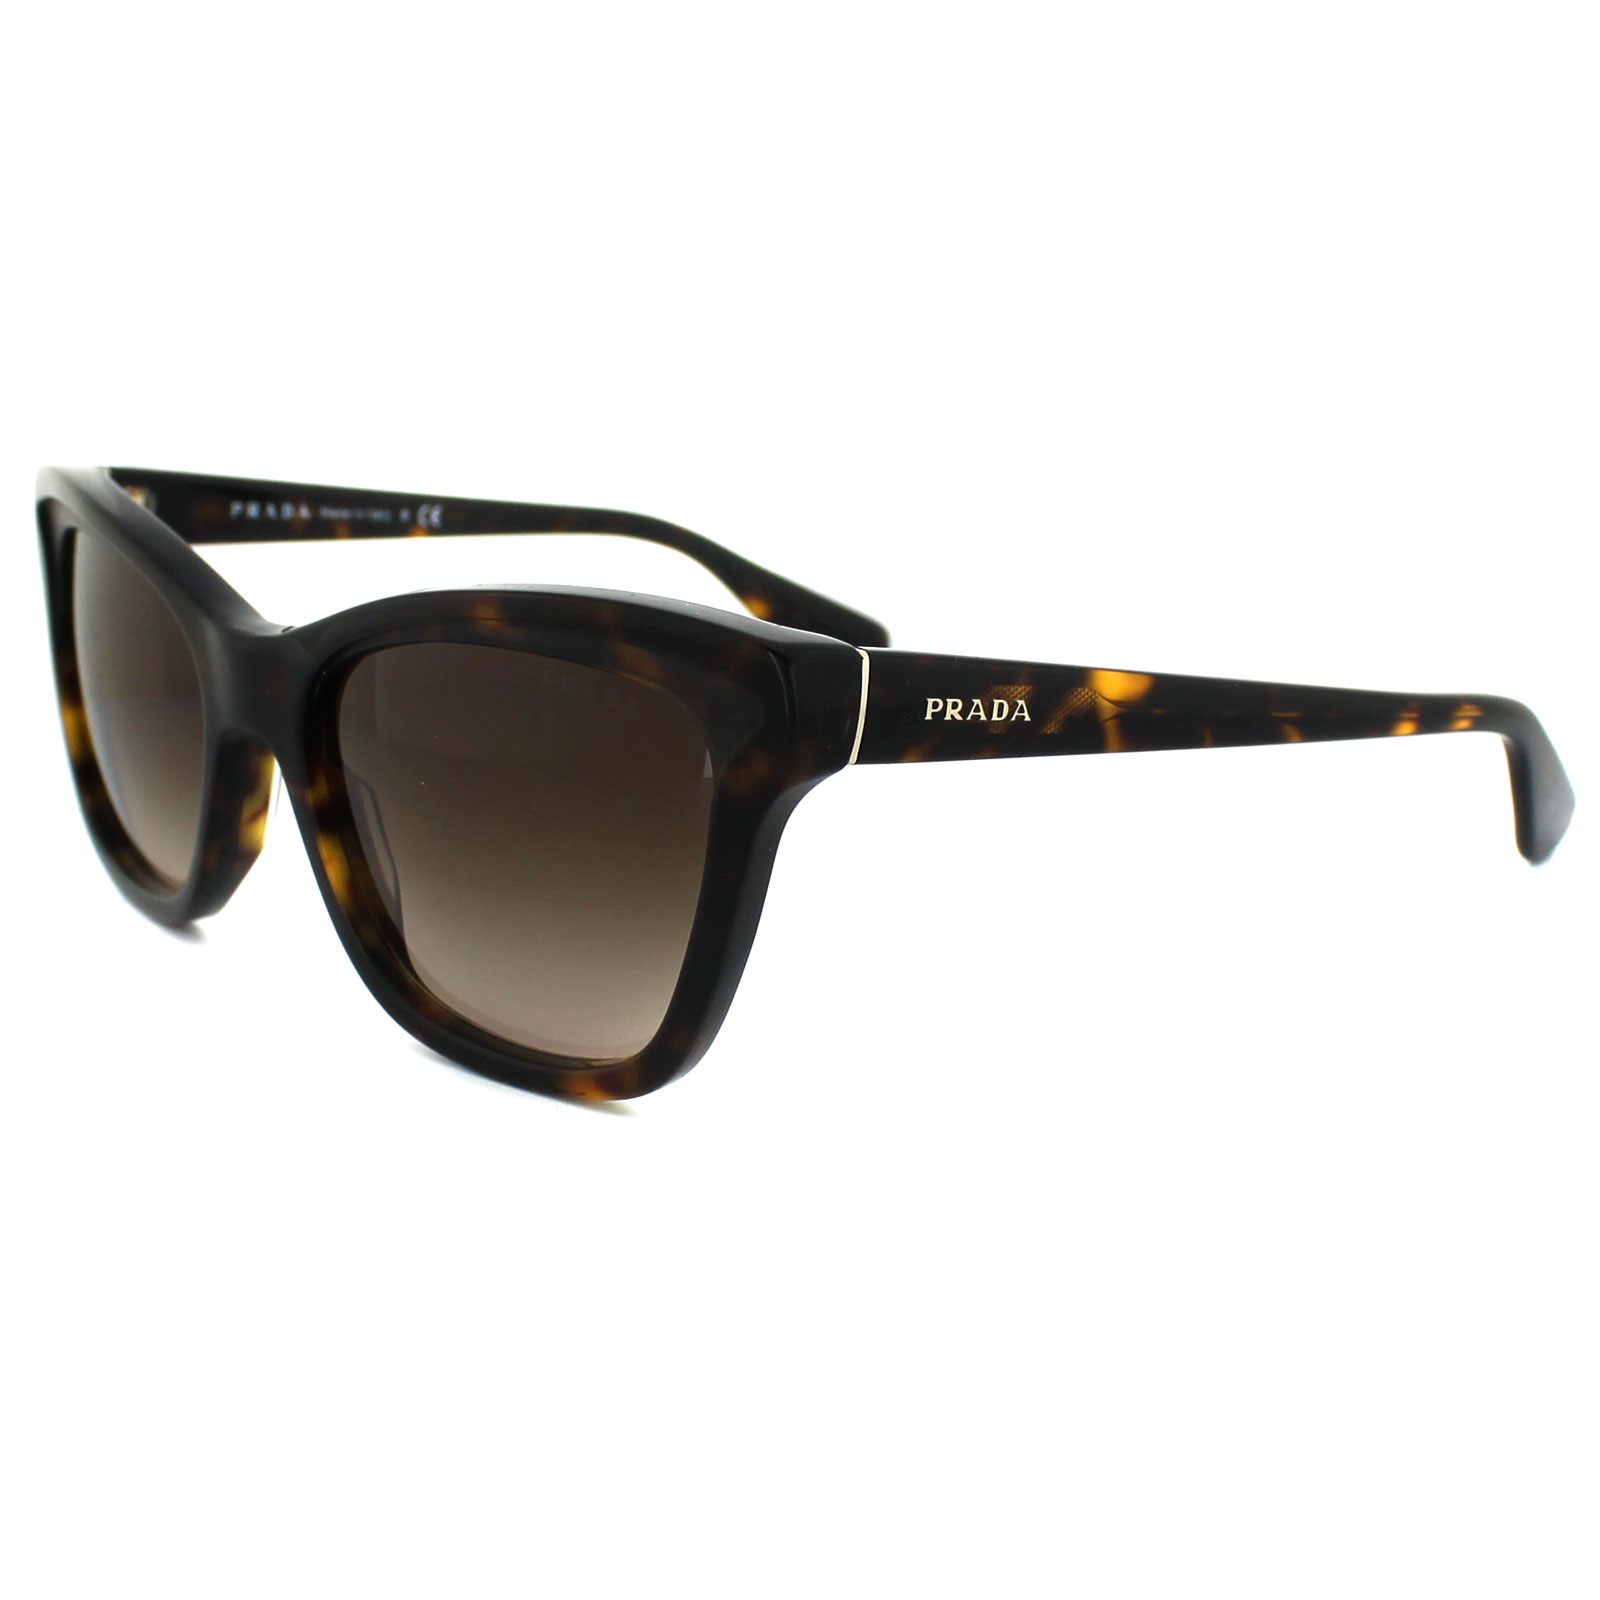 prada sunglasses 16ps 2au6s1 havana brown gradient 679420883779 ebay. Black Bedroom Furniture Sets. Home Design Ideas